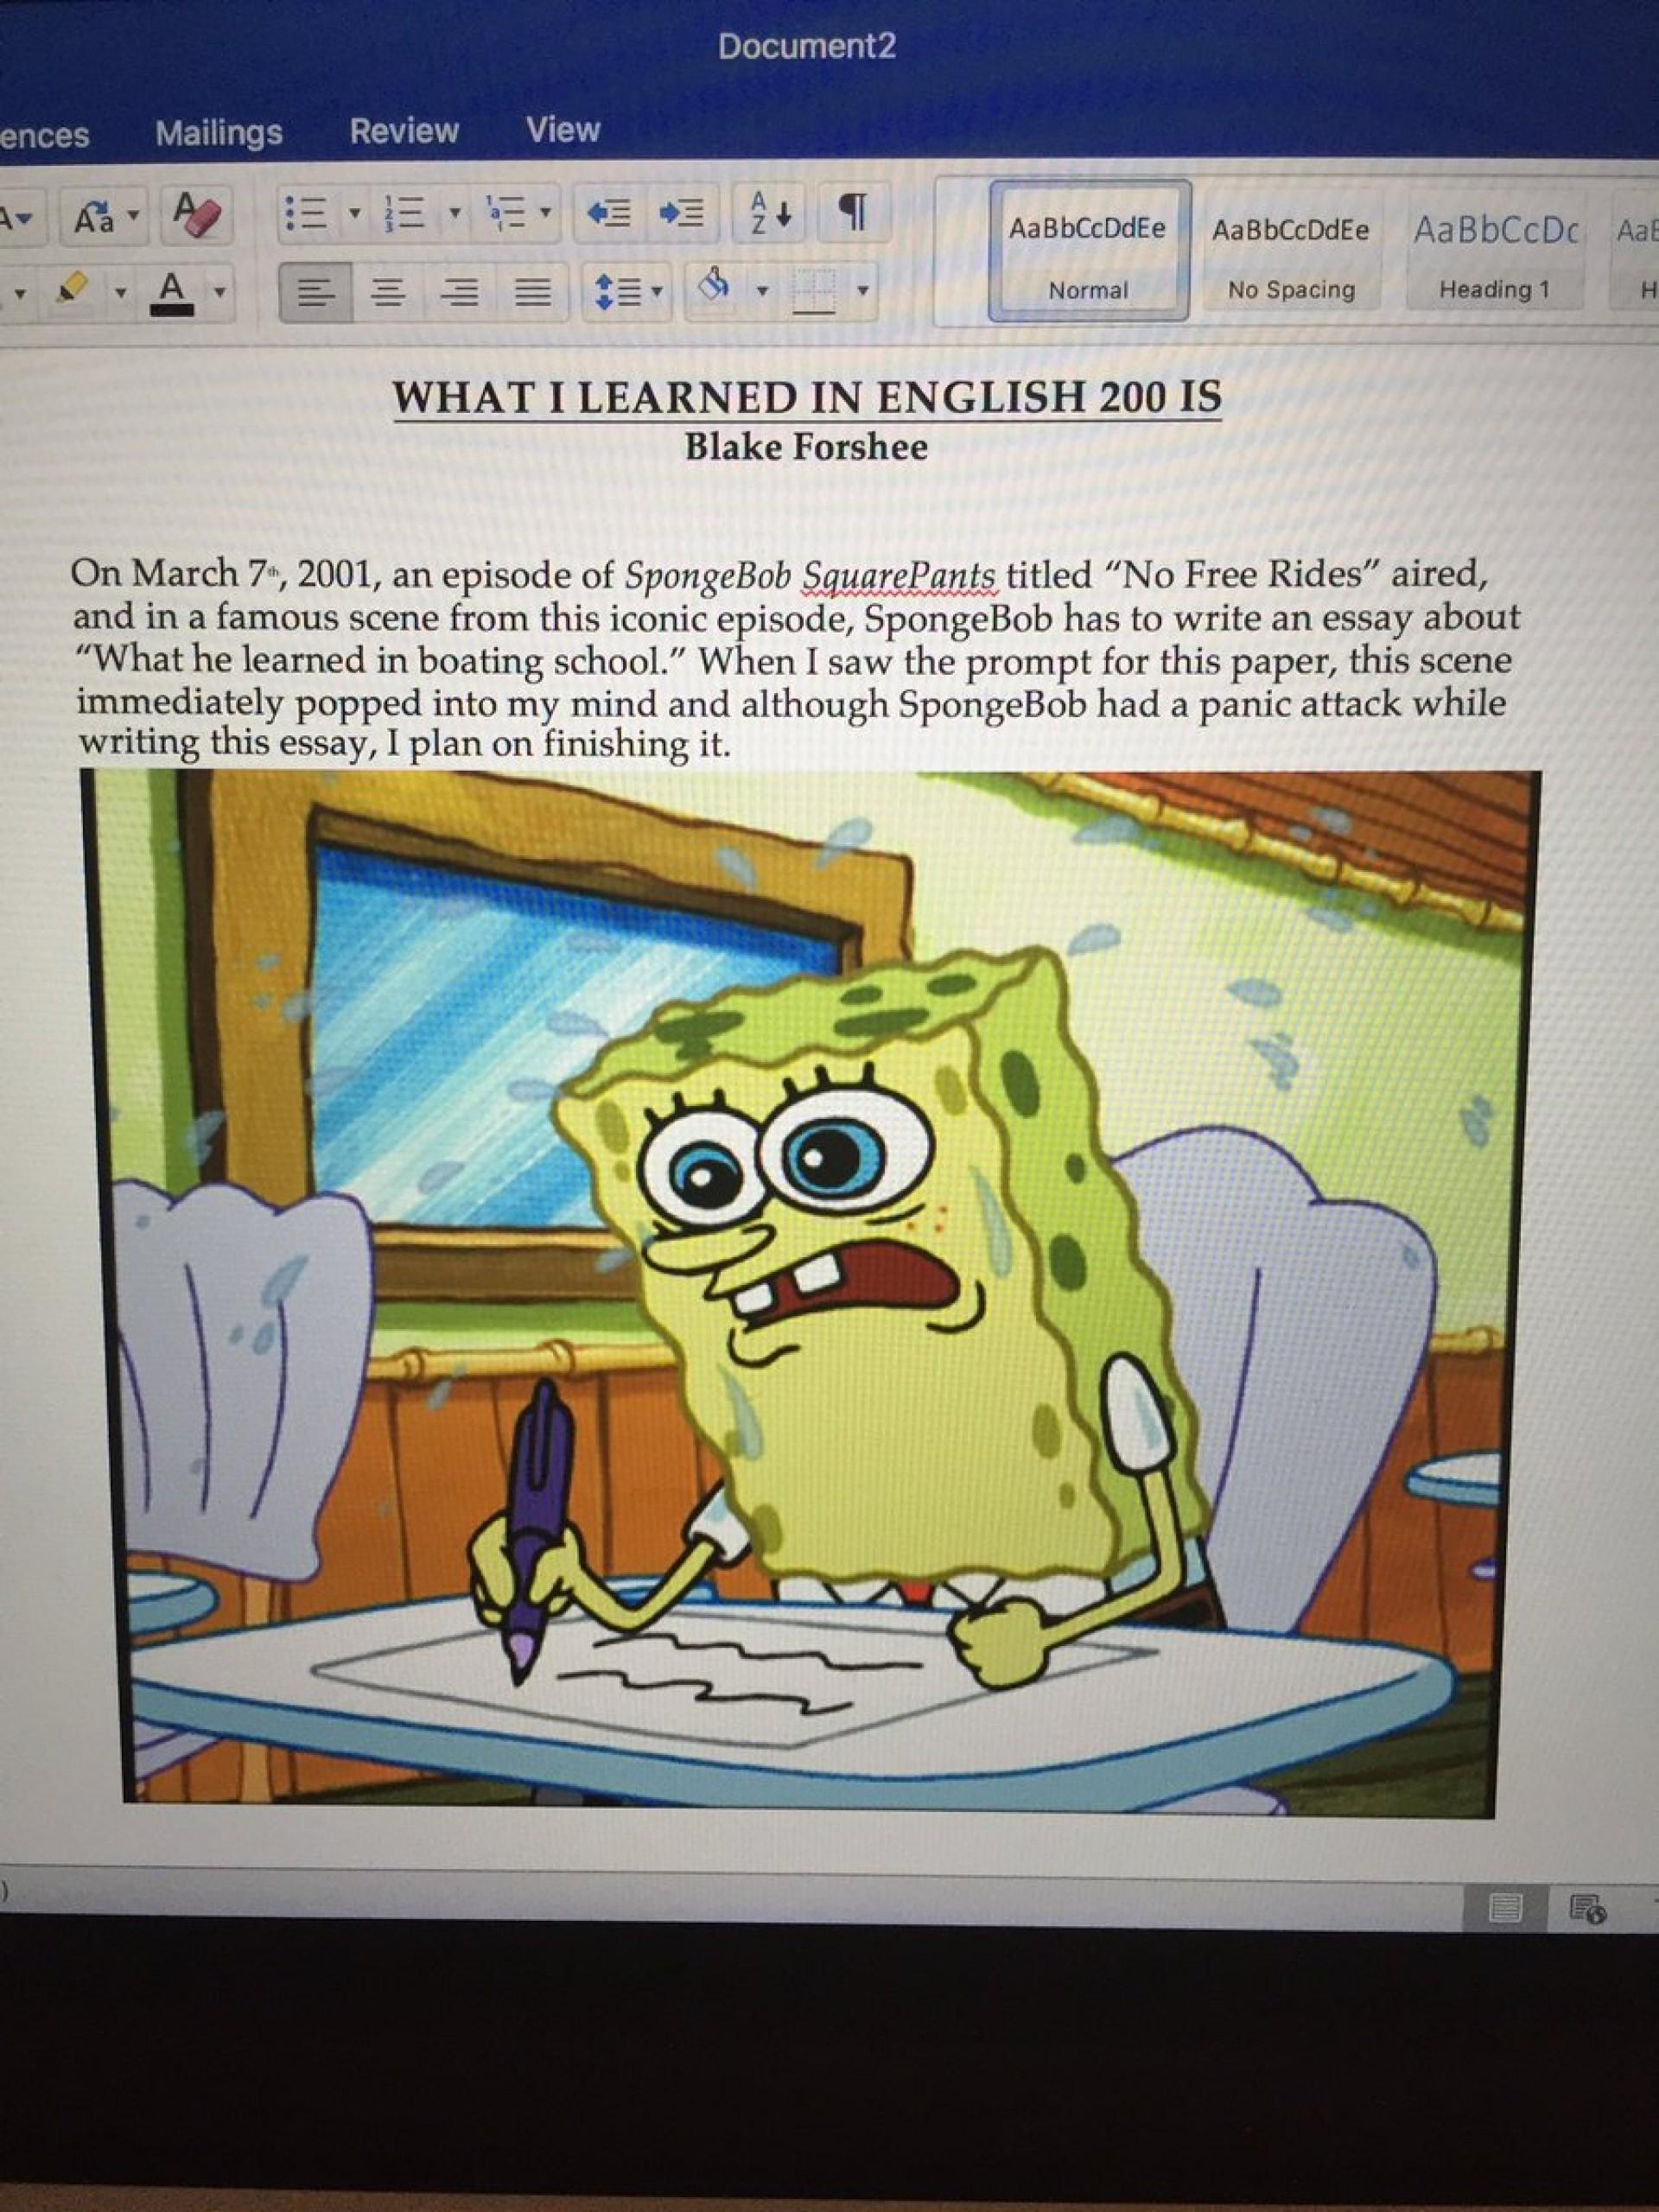 005 Essay Example Ben Smith Bensmith 15 Twitter Spongebob Episode Writing Cy9yjtixga Stirring Meme Generator Font 1920